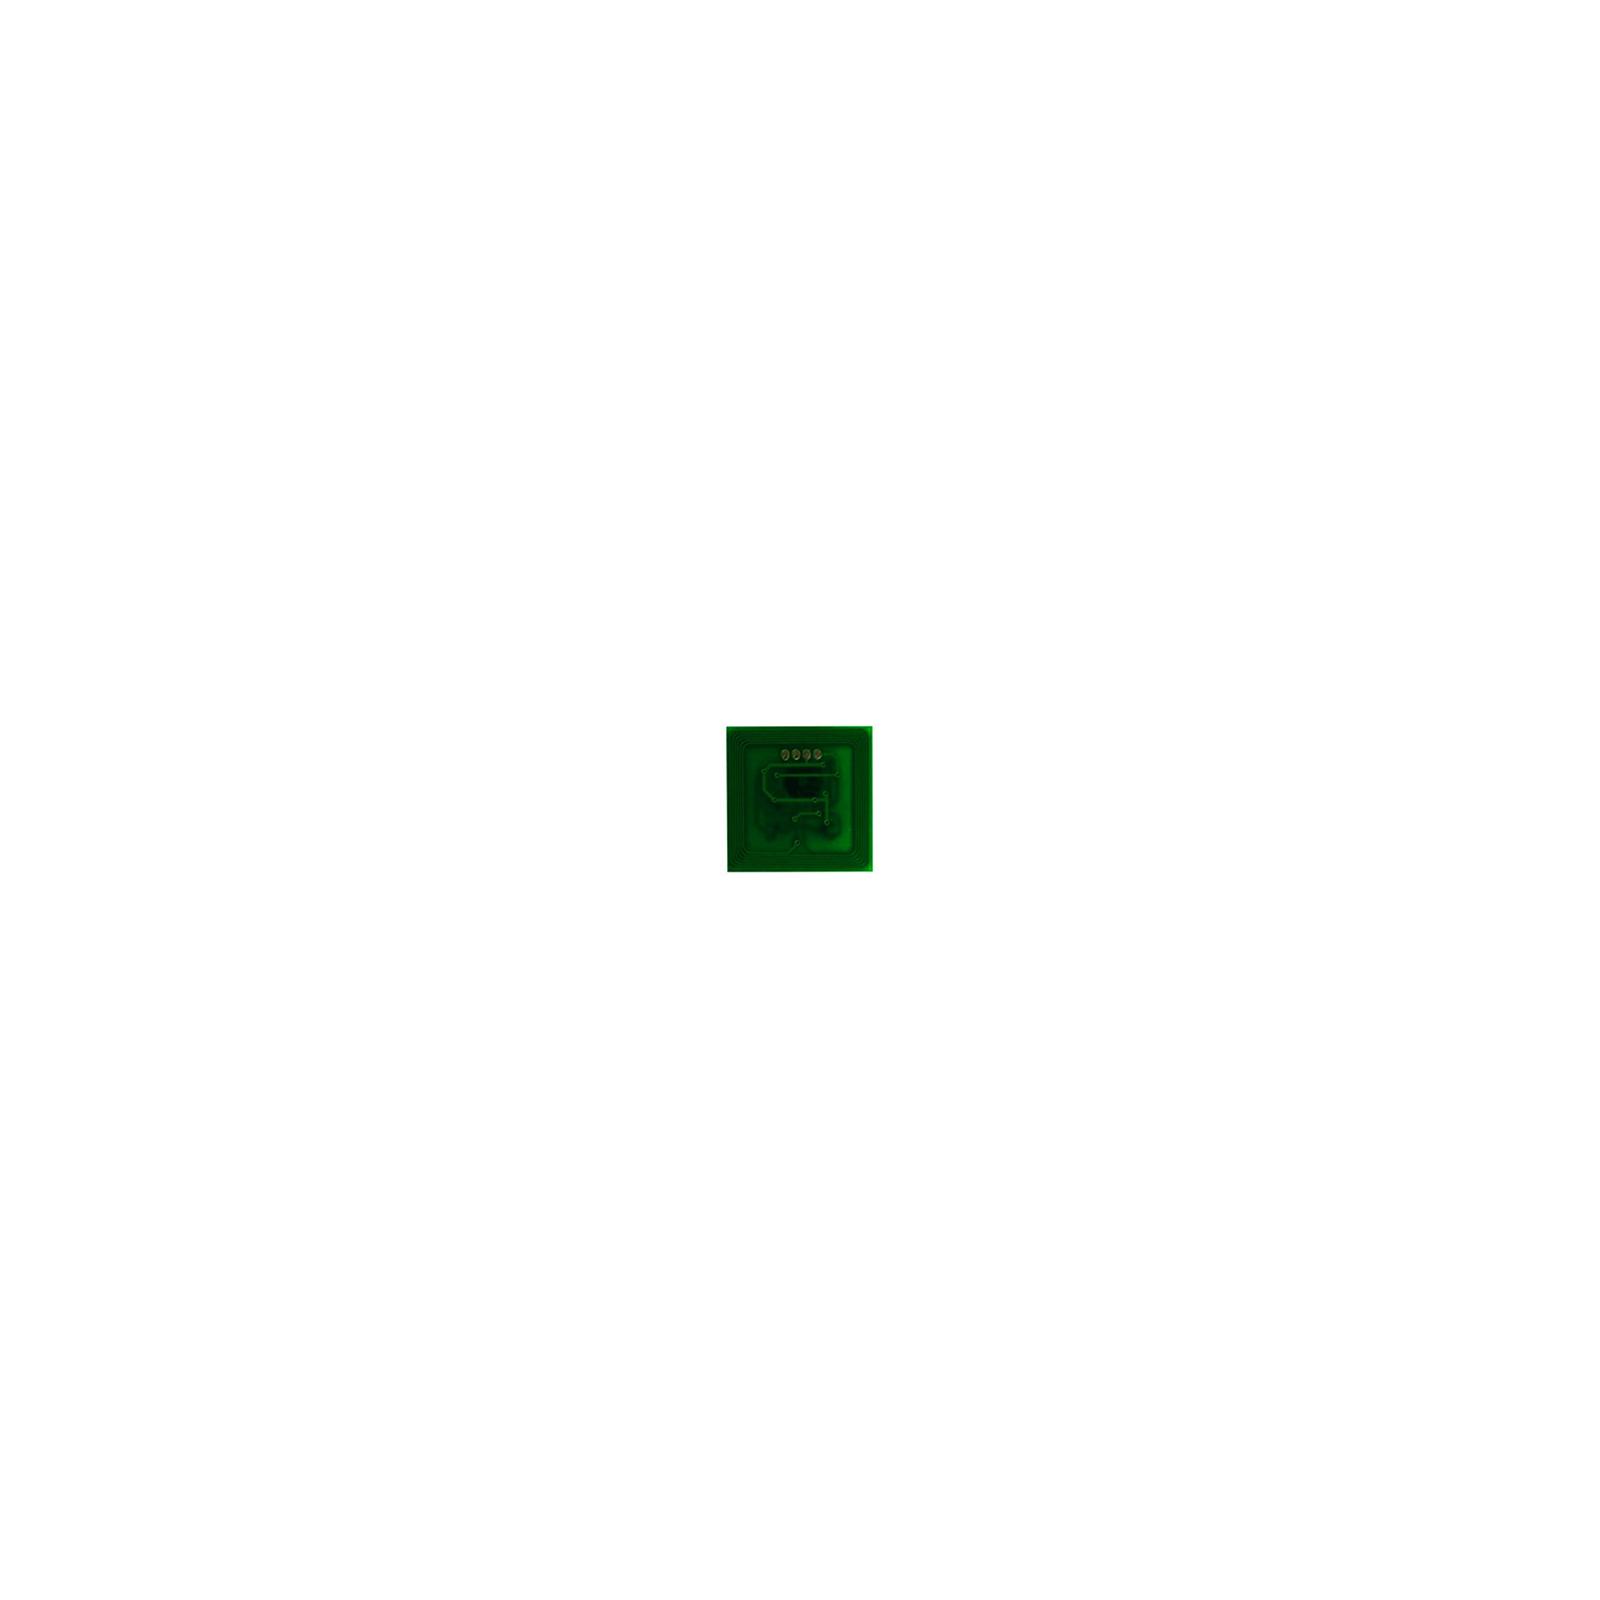 Чип для картриджа Xerox Phaser 5500 (113R00670) 60k Static Control (X5500DUCP)